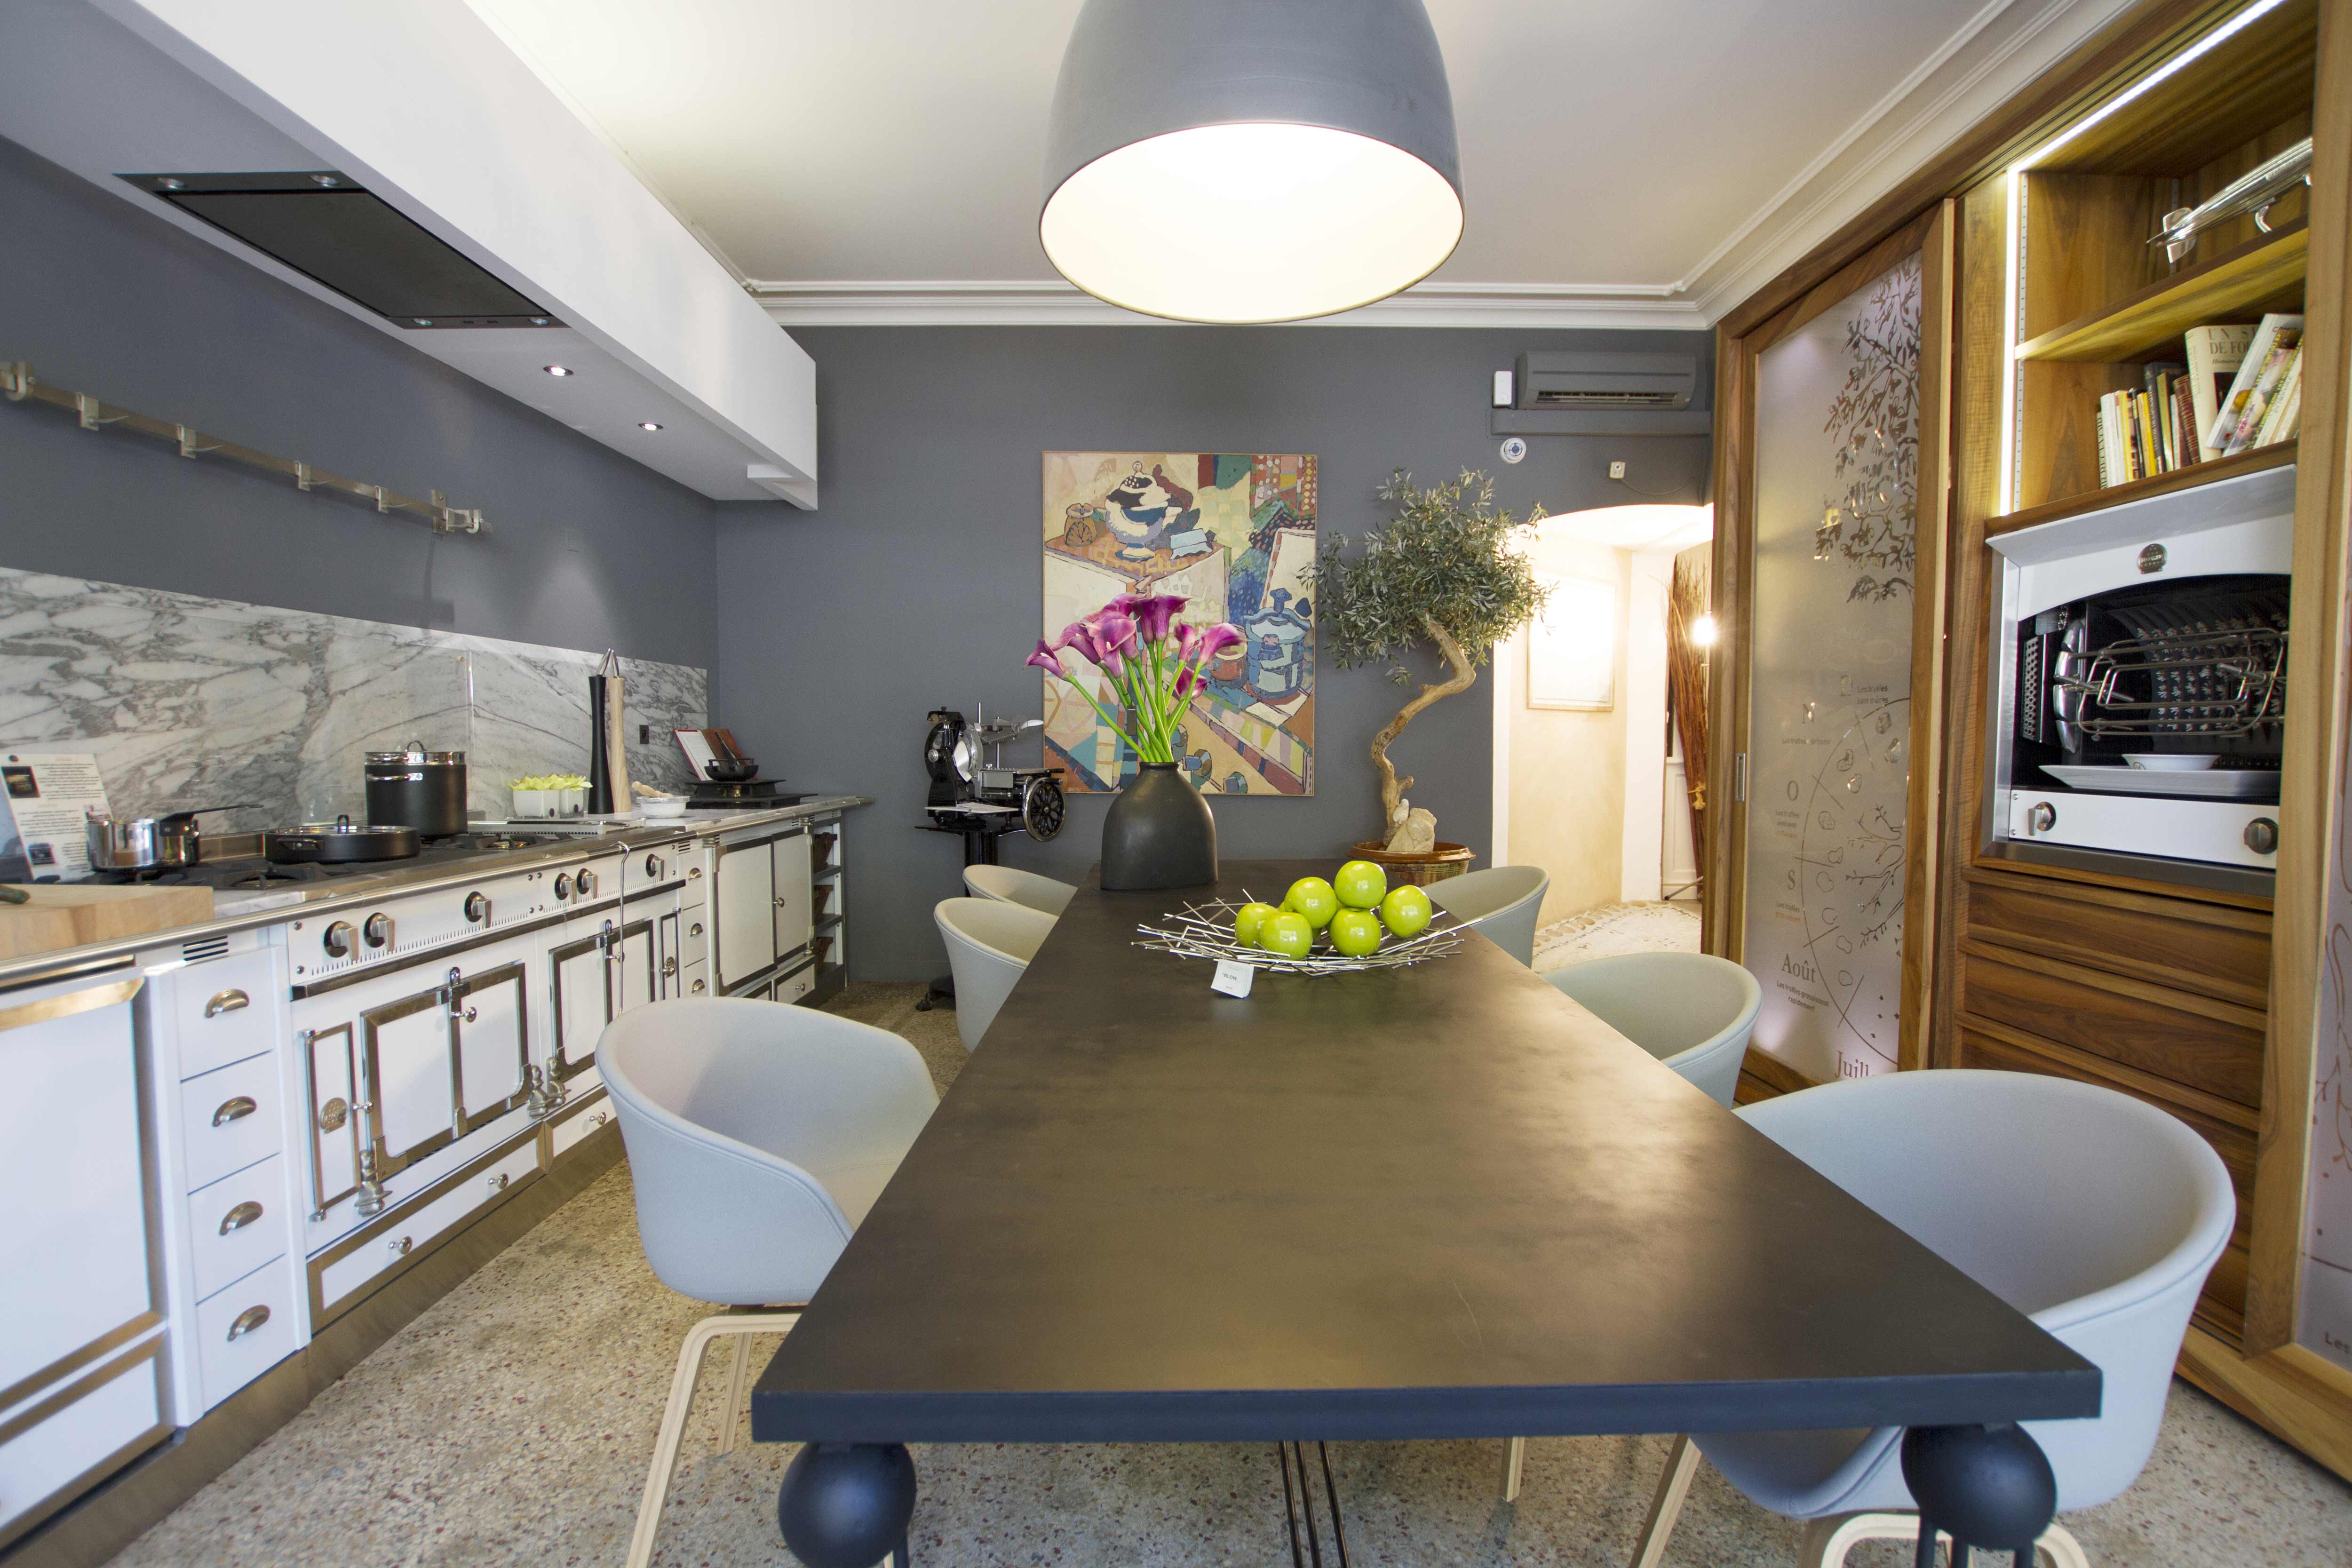 magasin avignon 11 cuisines mouvement. Black Bedroom Furniture Sets. Home Design Ideas